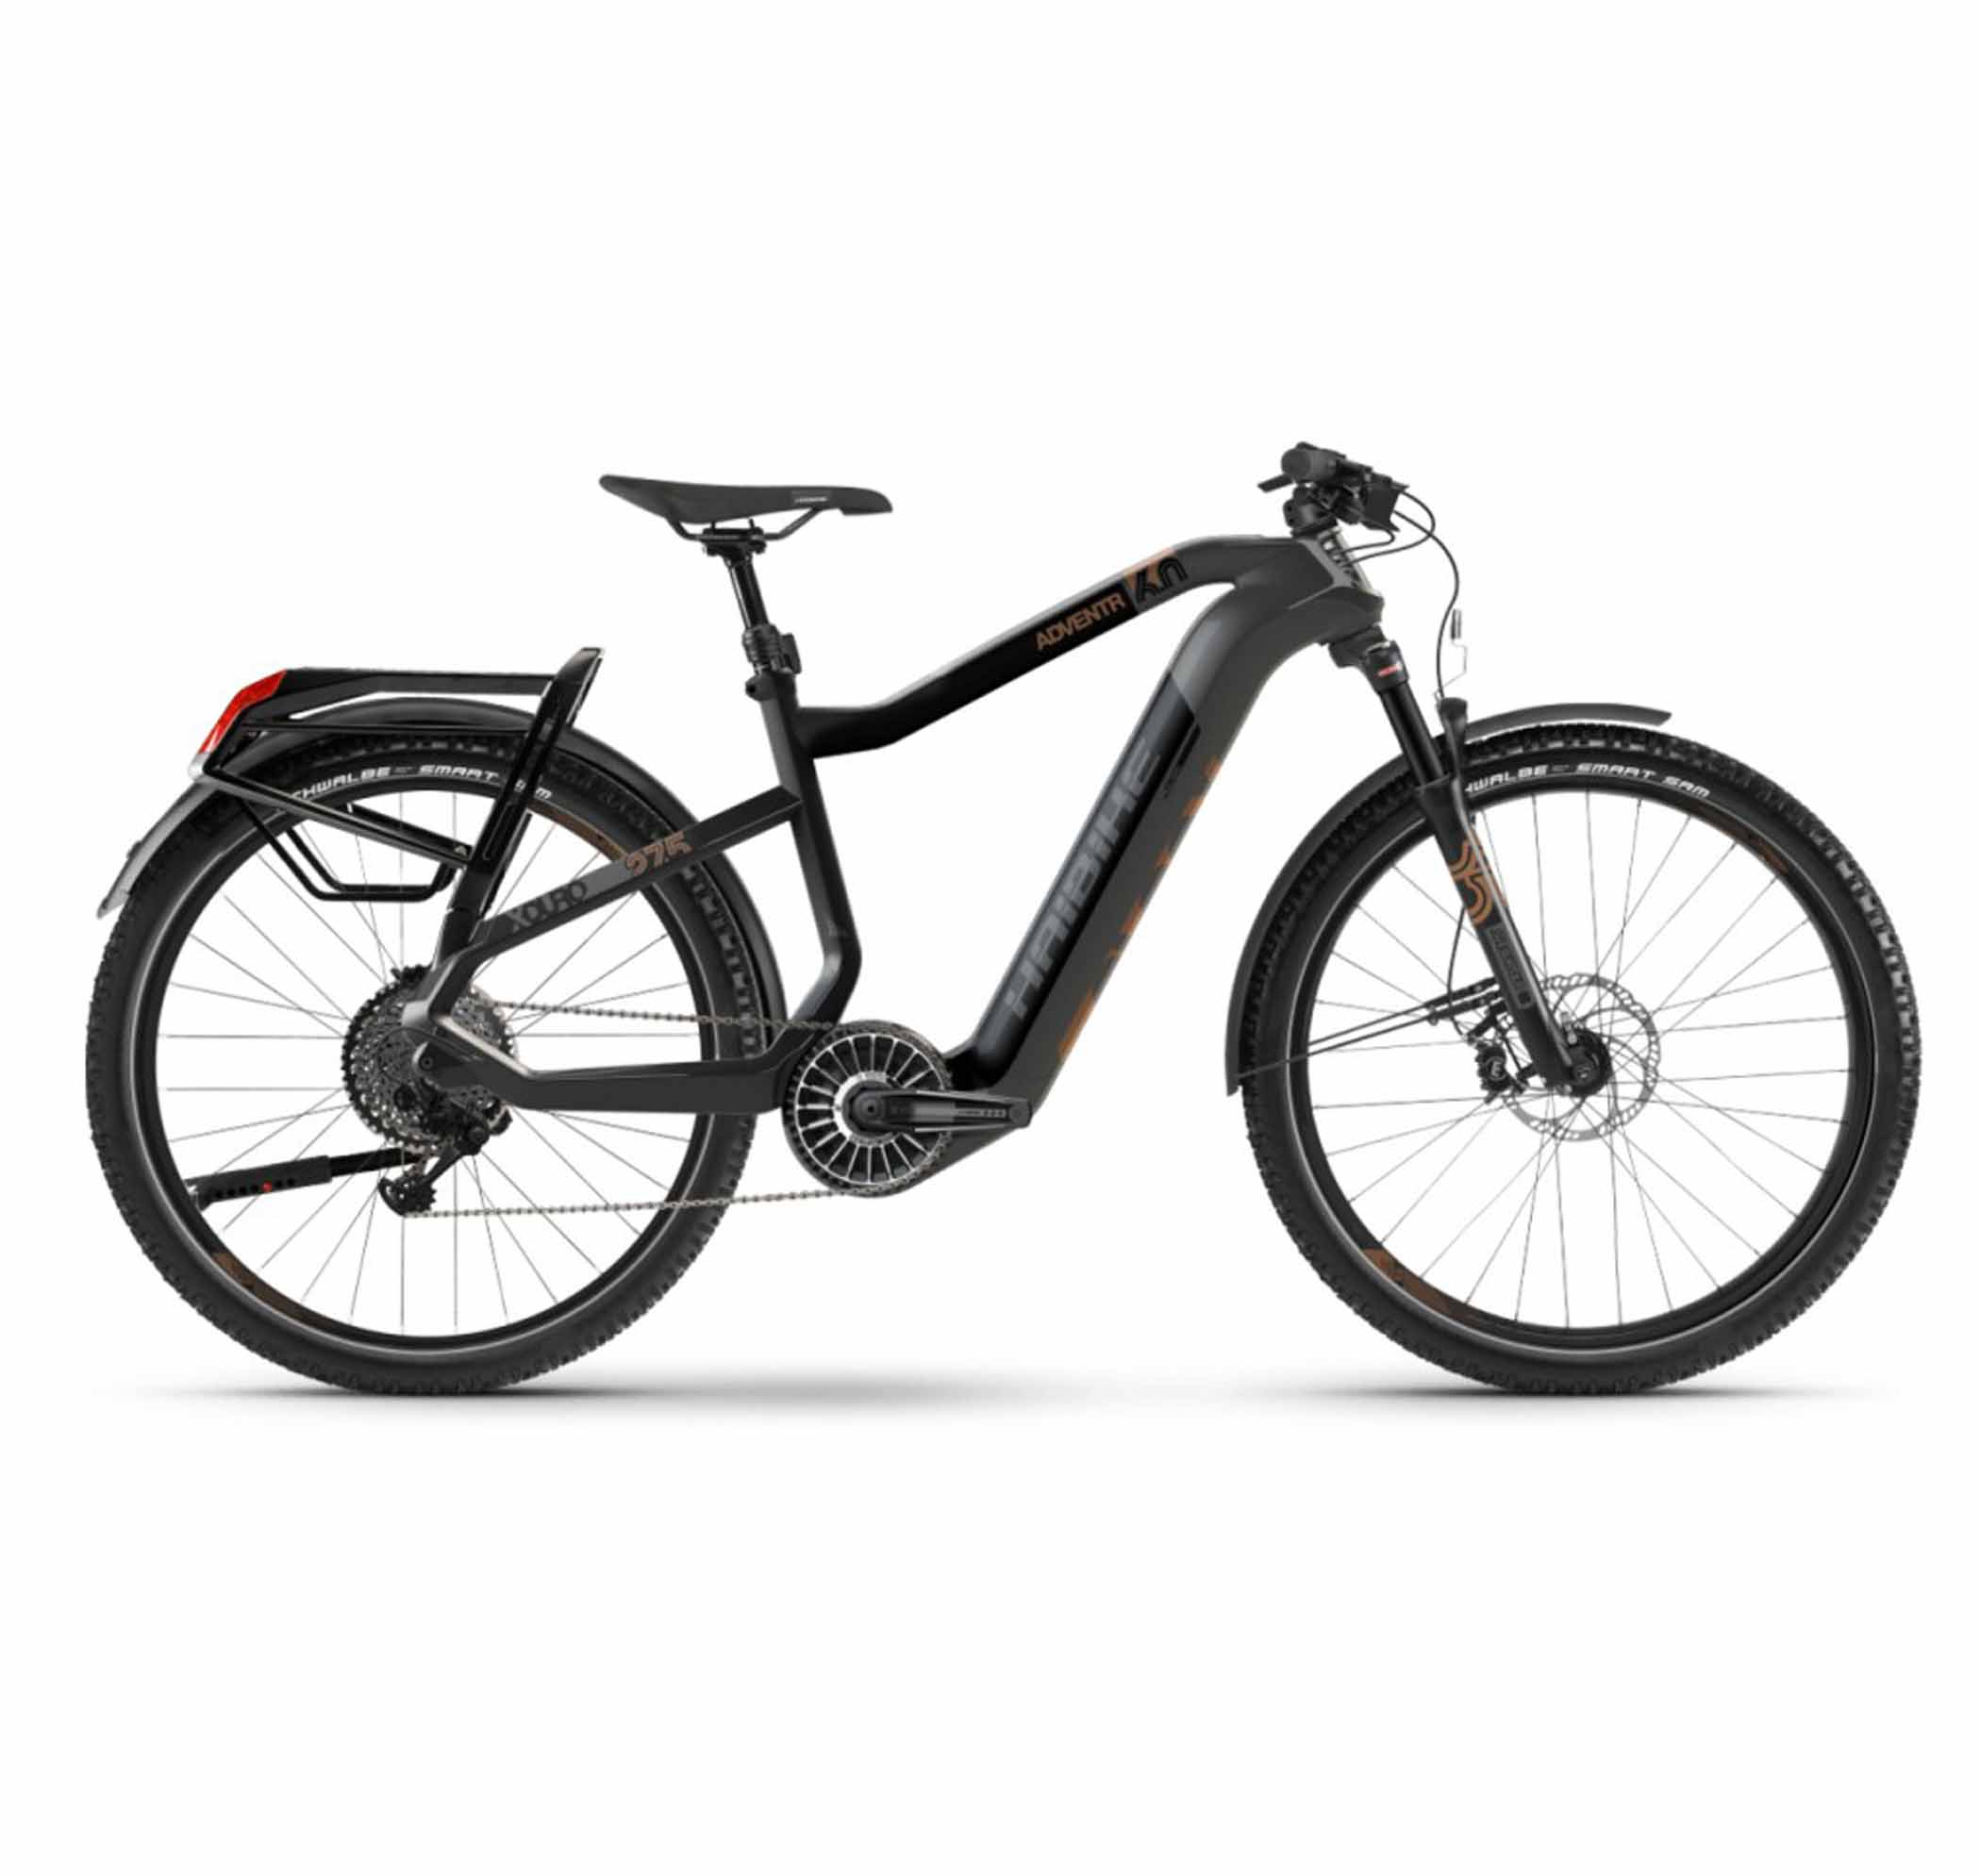 Haibike_Rodeo_Bike_Flyon_XDURO_Adventr_6.0